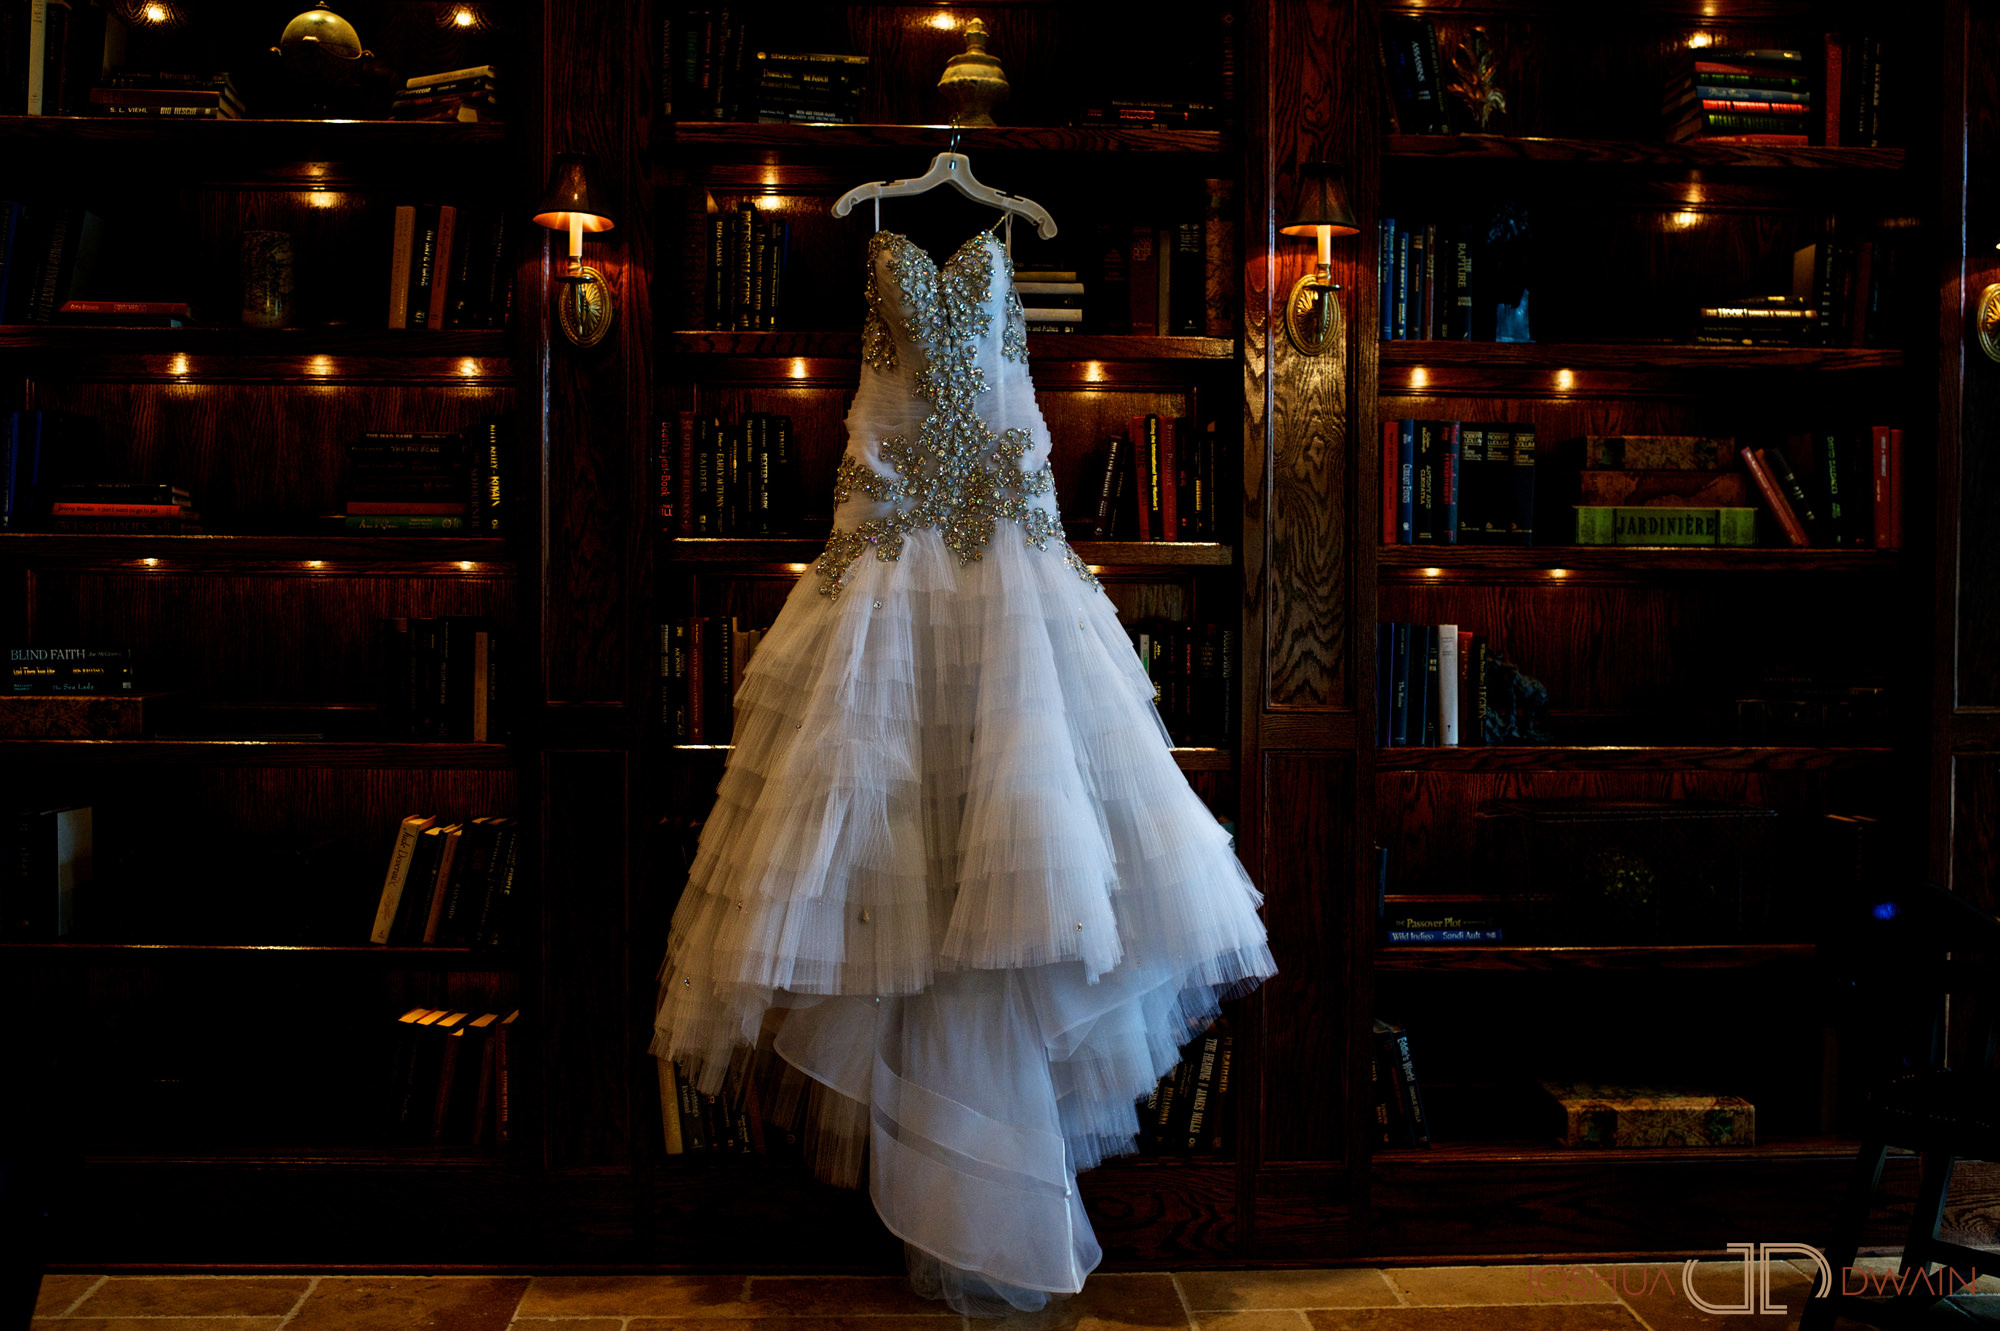 cadisha-antoine-002-ashford-estates-allentown-nj-wedding-photographer-joshua-dwain-photography-